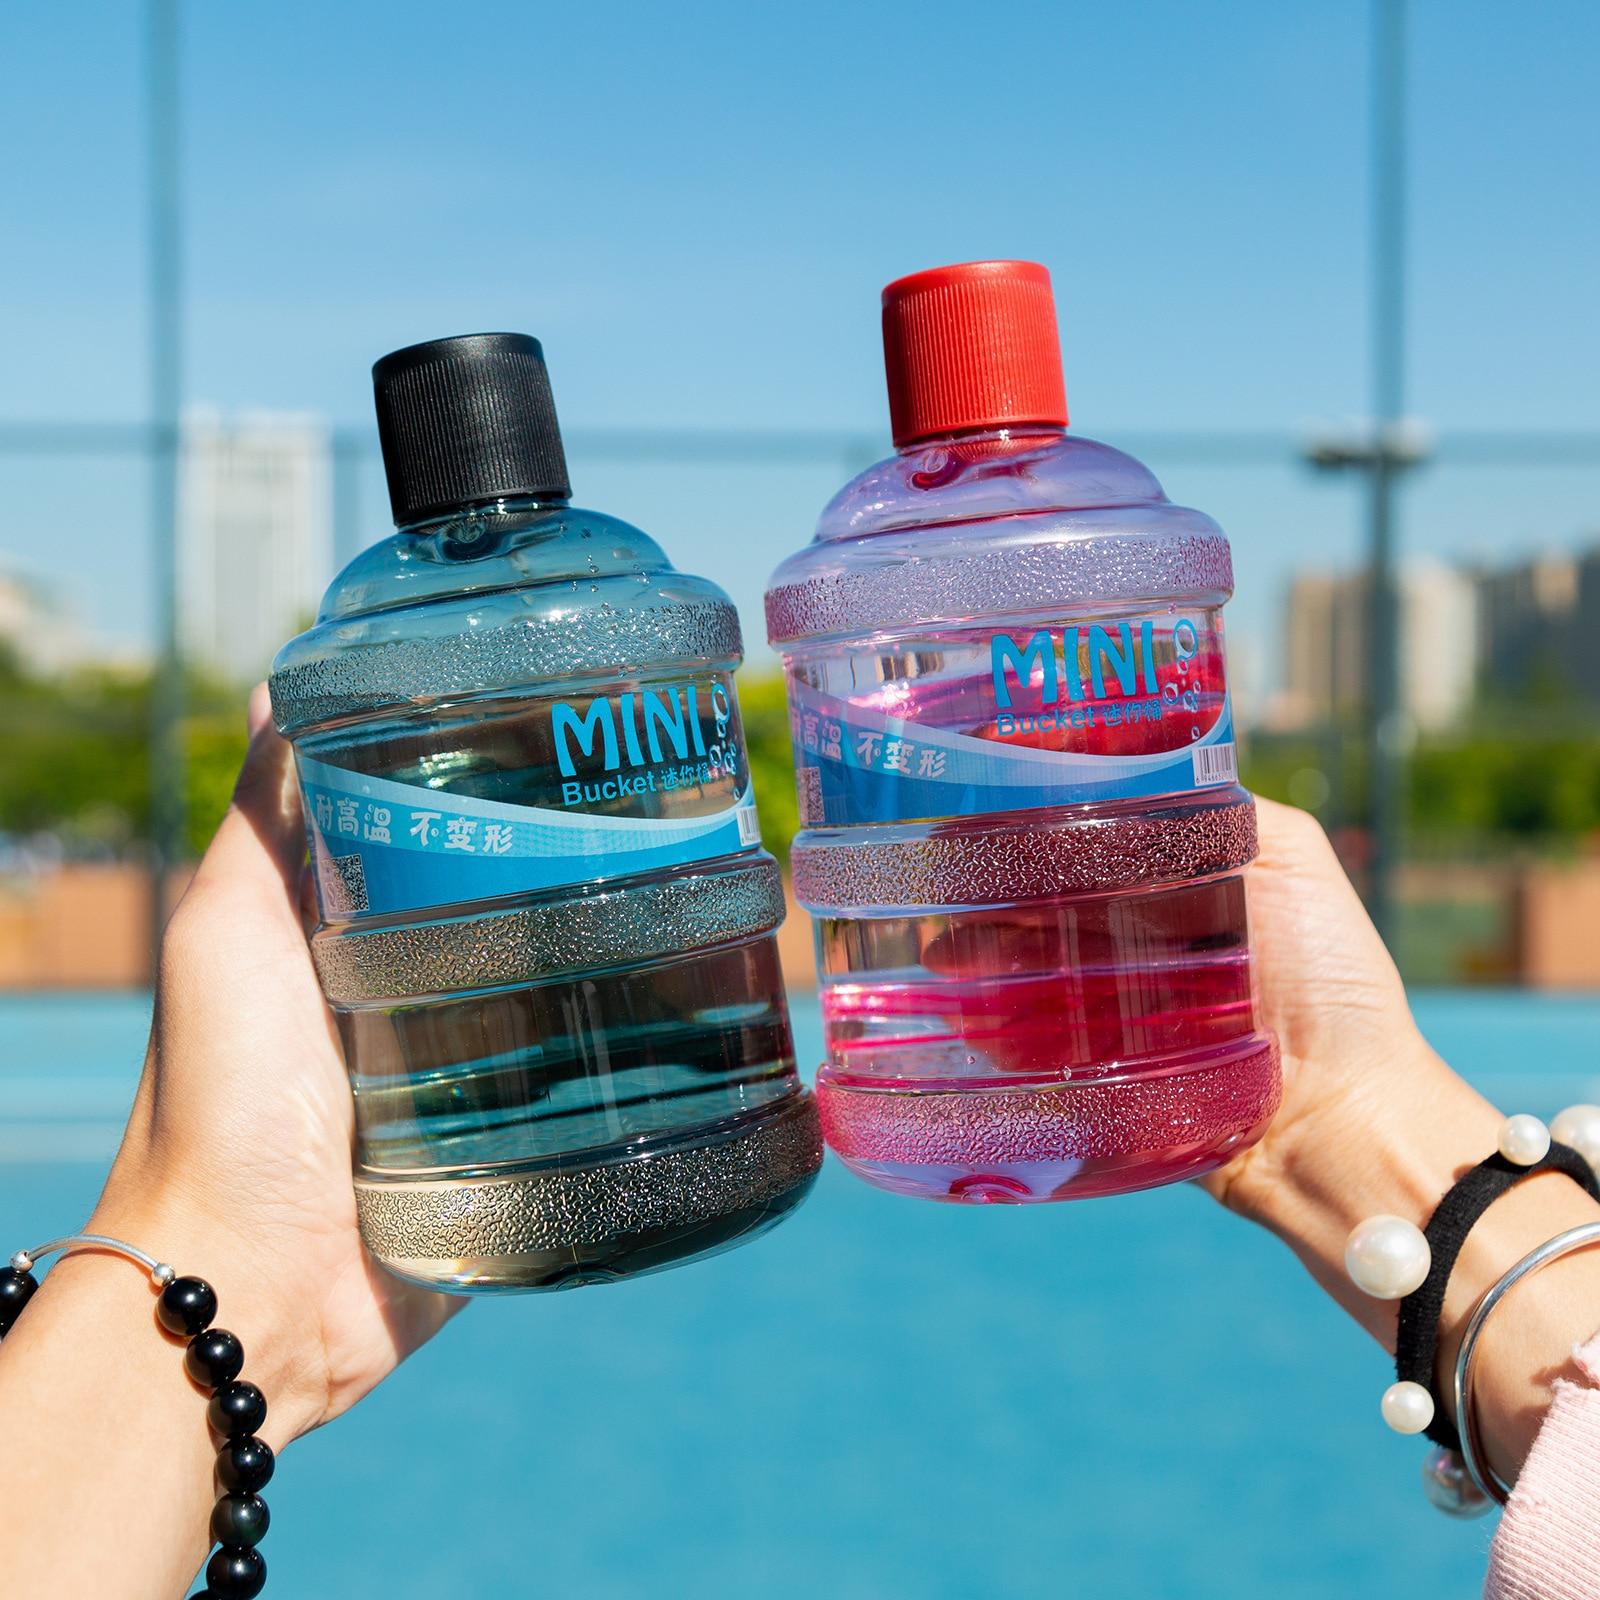 630ml Cartoon Bucket Drink Water Bottle Cup Plasticu Nique for Baby Kids Children Student Boy Girl Creative Gift Wholesale